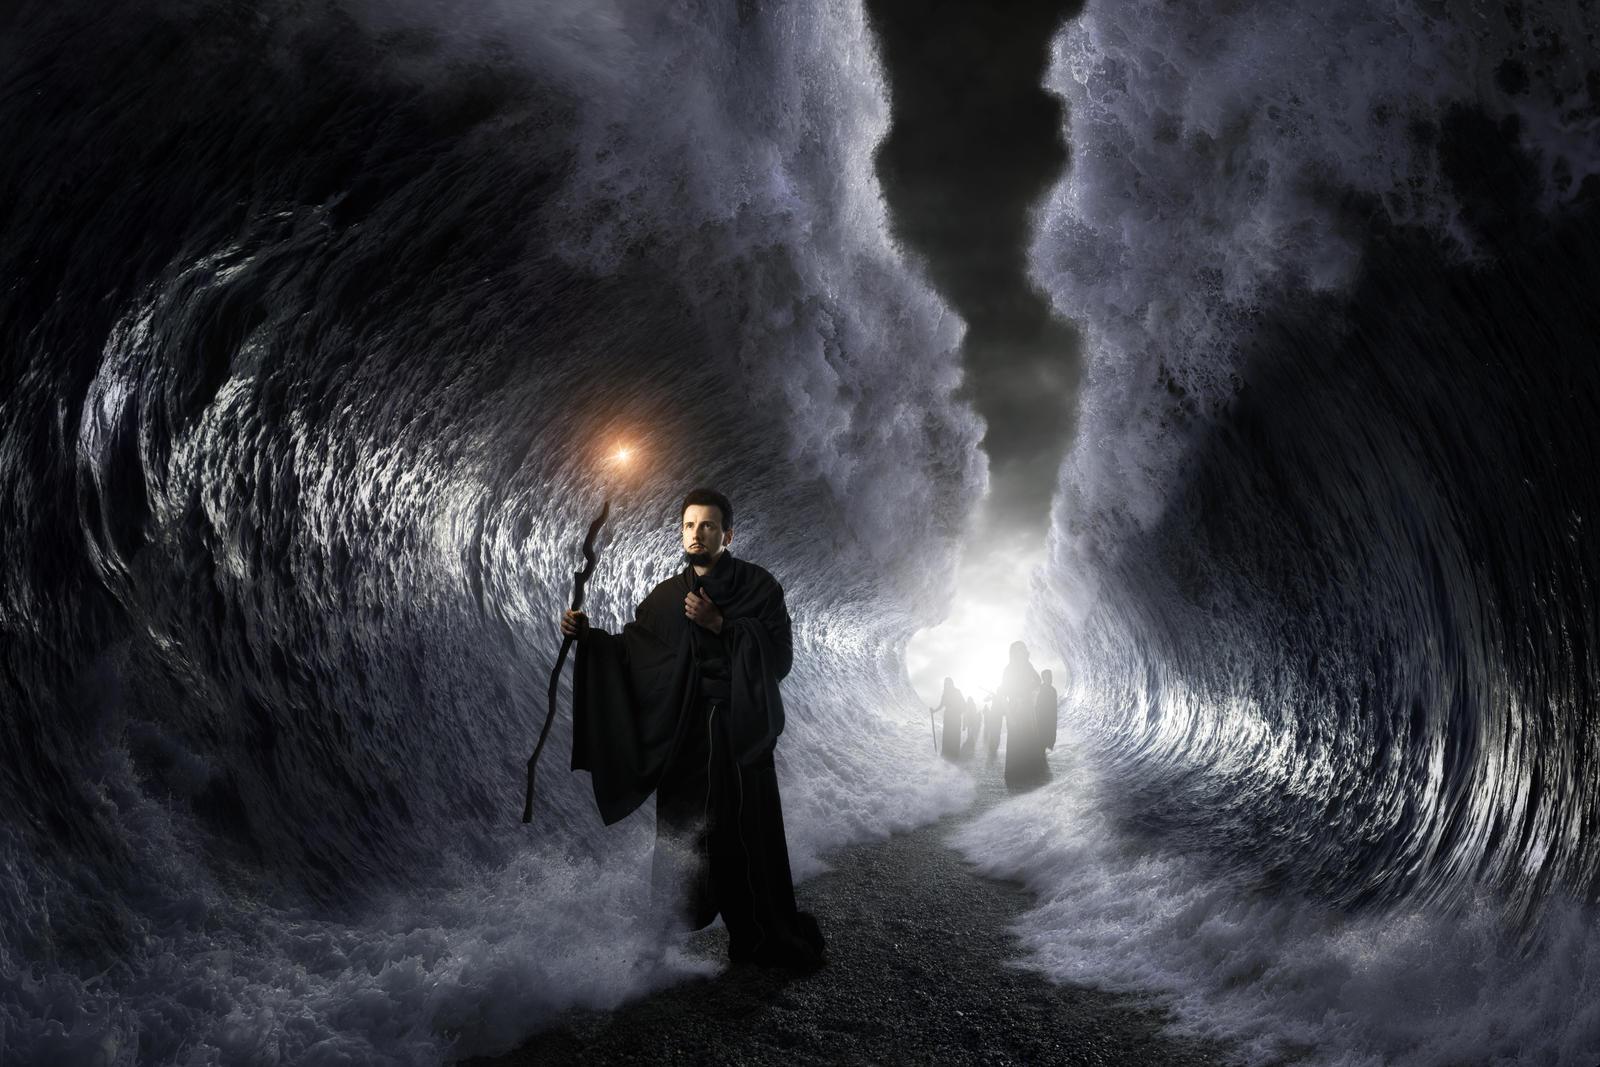 Moses Ten Commandments Movie Exodus by gyaban on De...